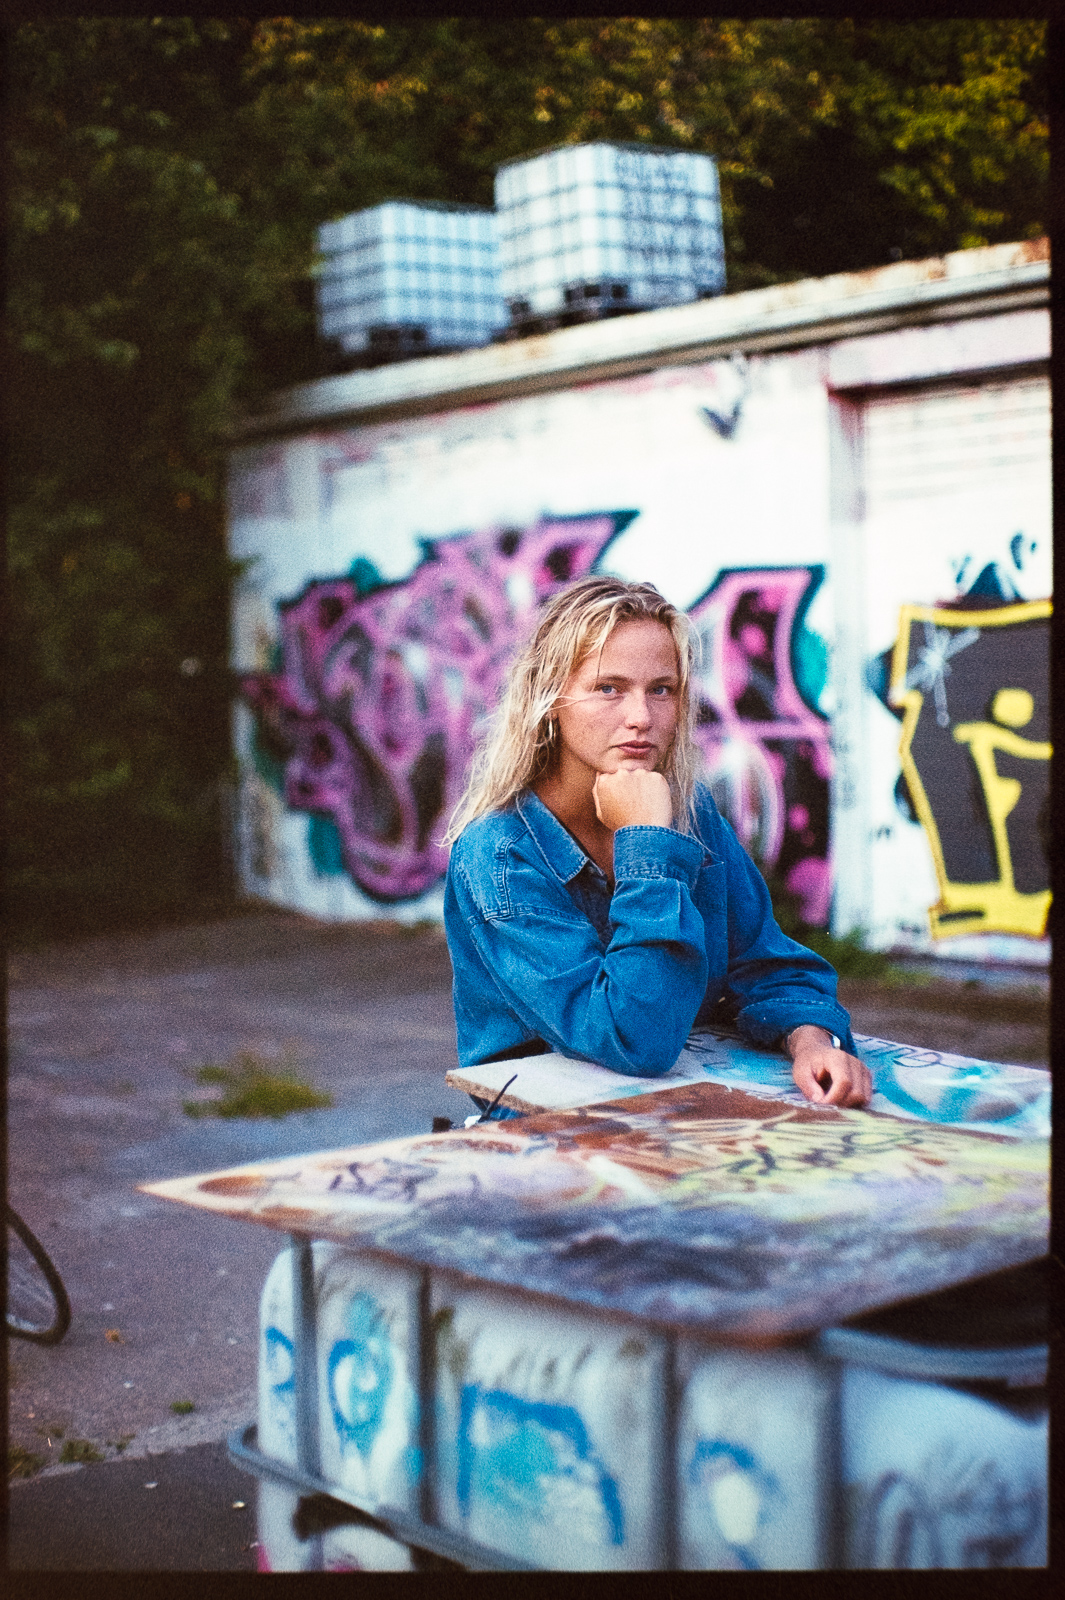 Film photography, almjohannes, film, johannes alm, minolta x500, fashion photography, graffiti,